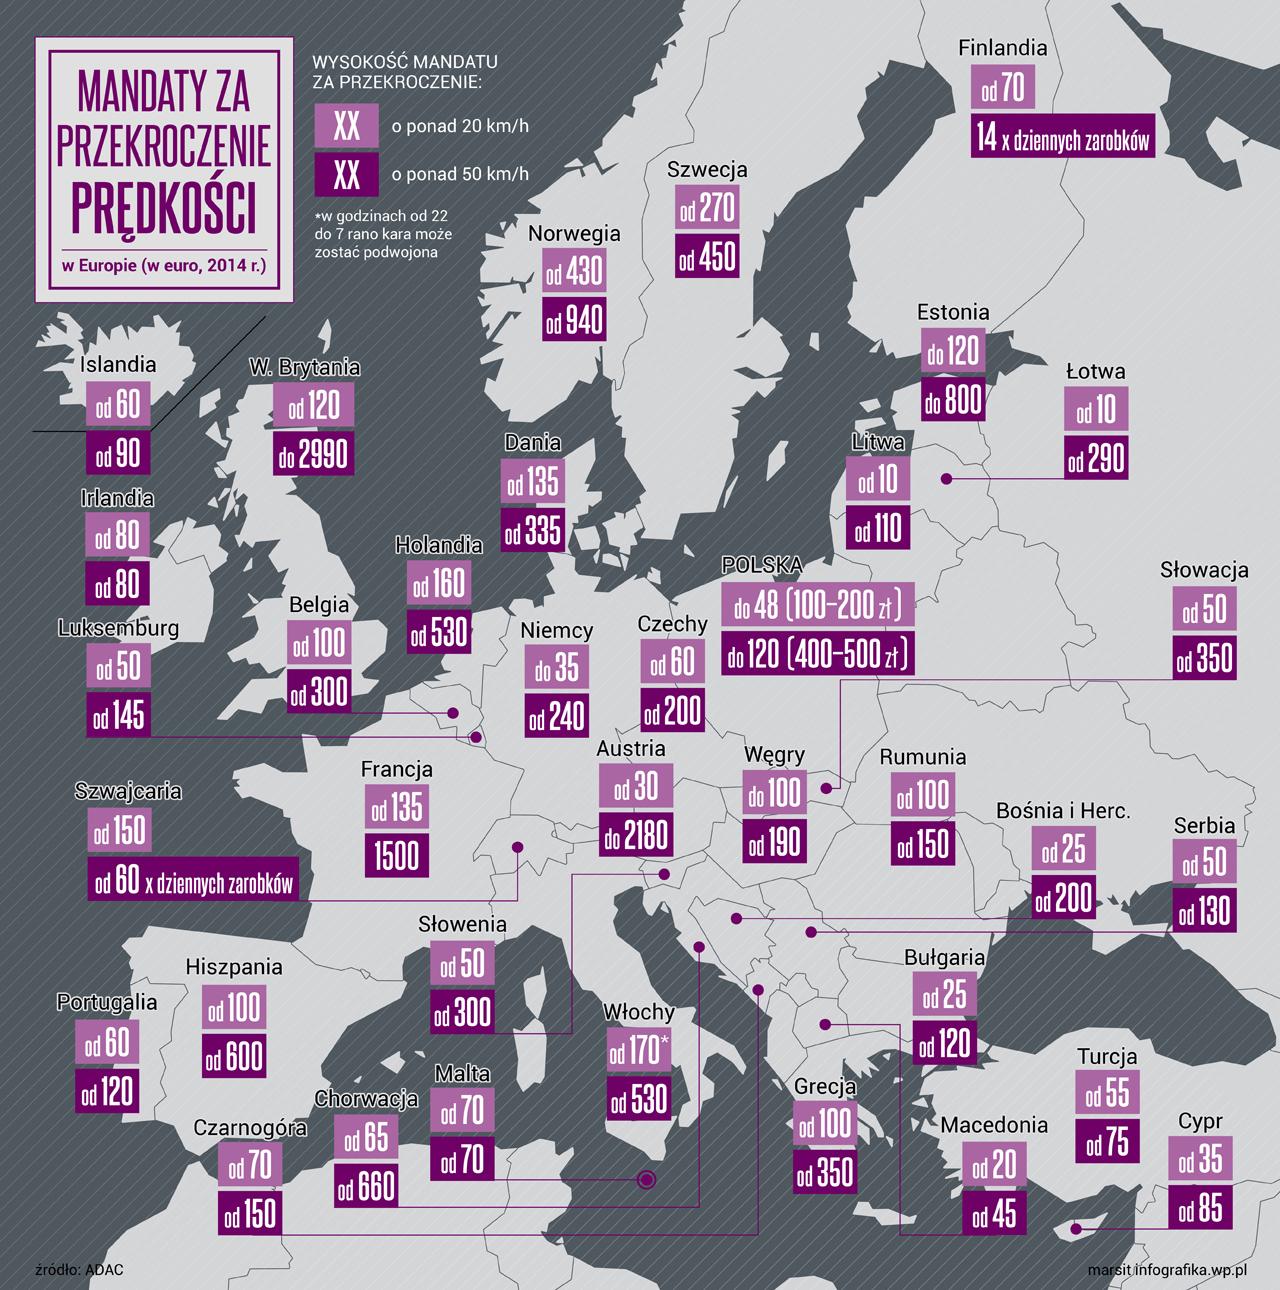 http://i.wp.pl/a/f/jpeg/33569/mandaty_predkosc_1280_infografika.jpeg